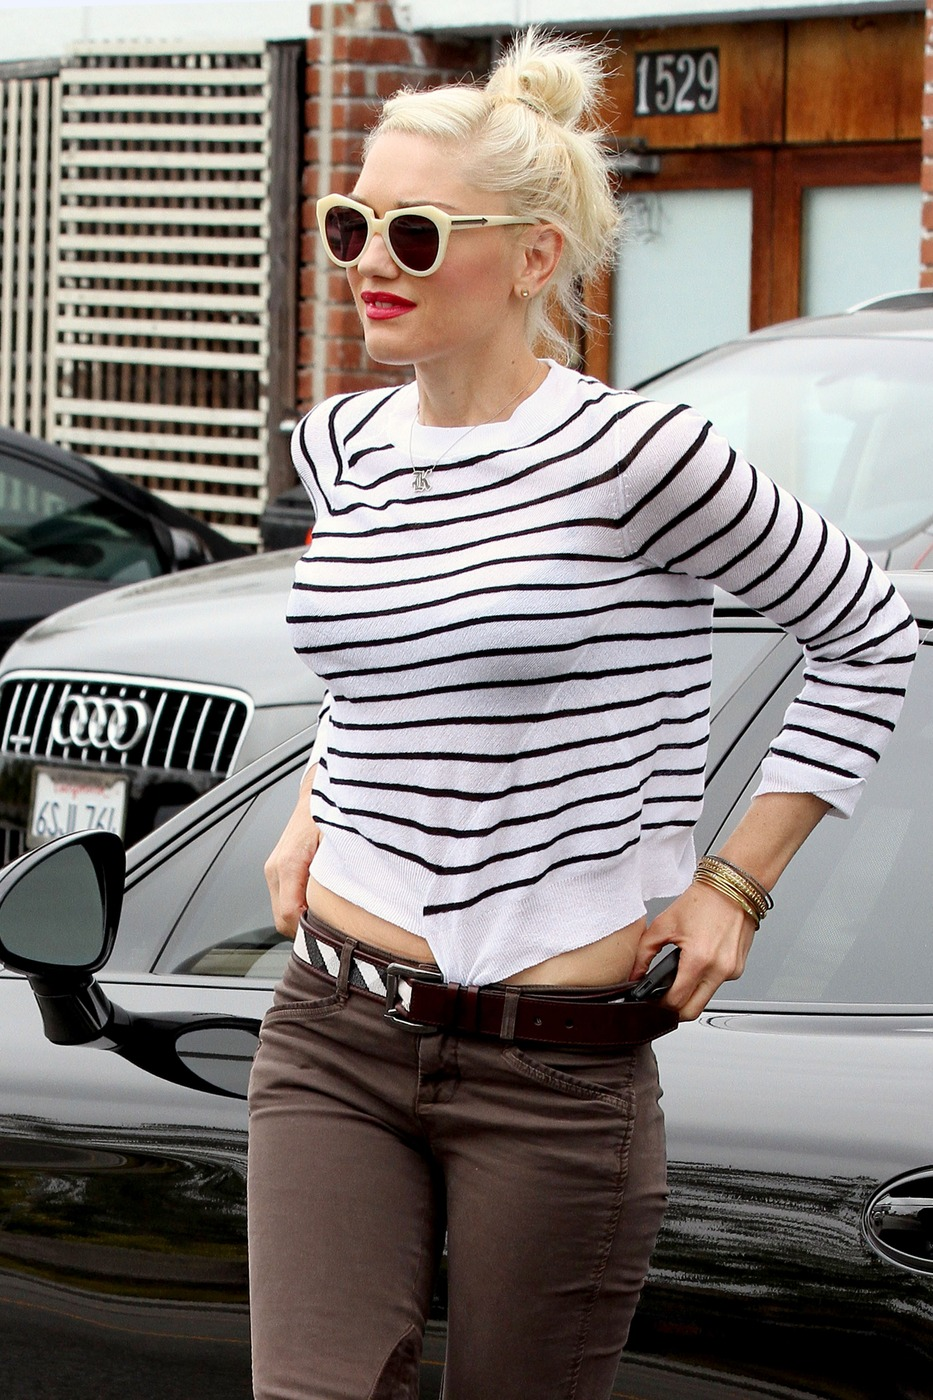 Gwen Stefani in Cropped Top